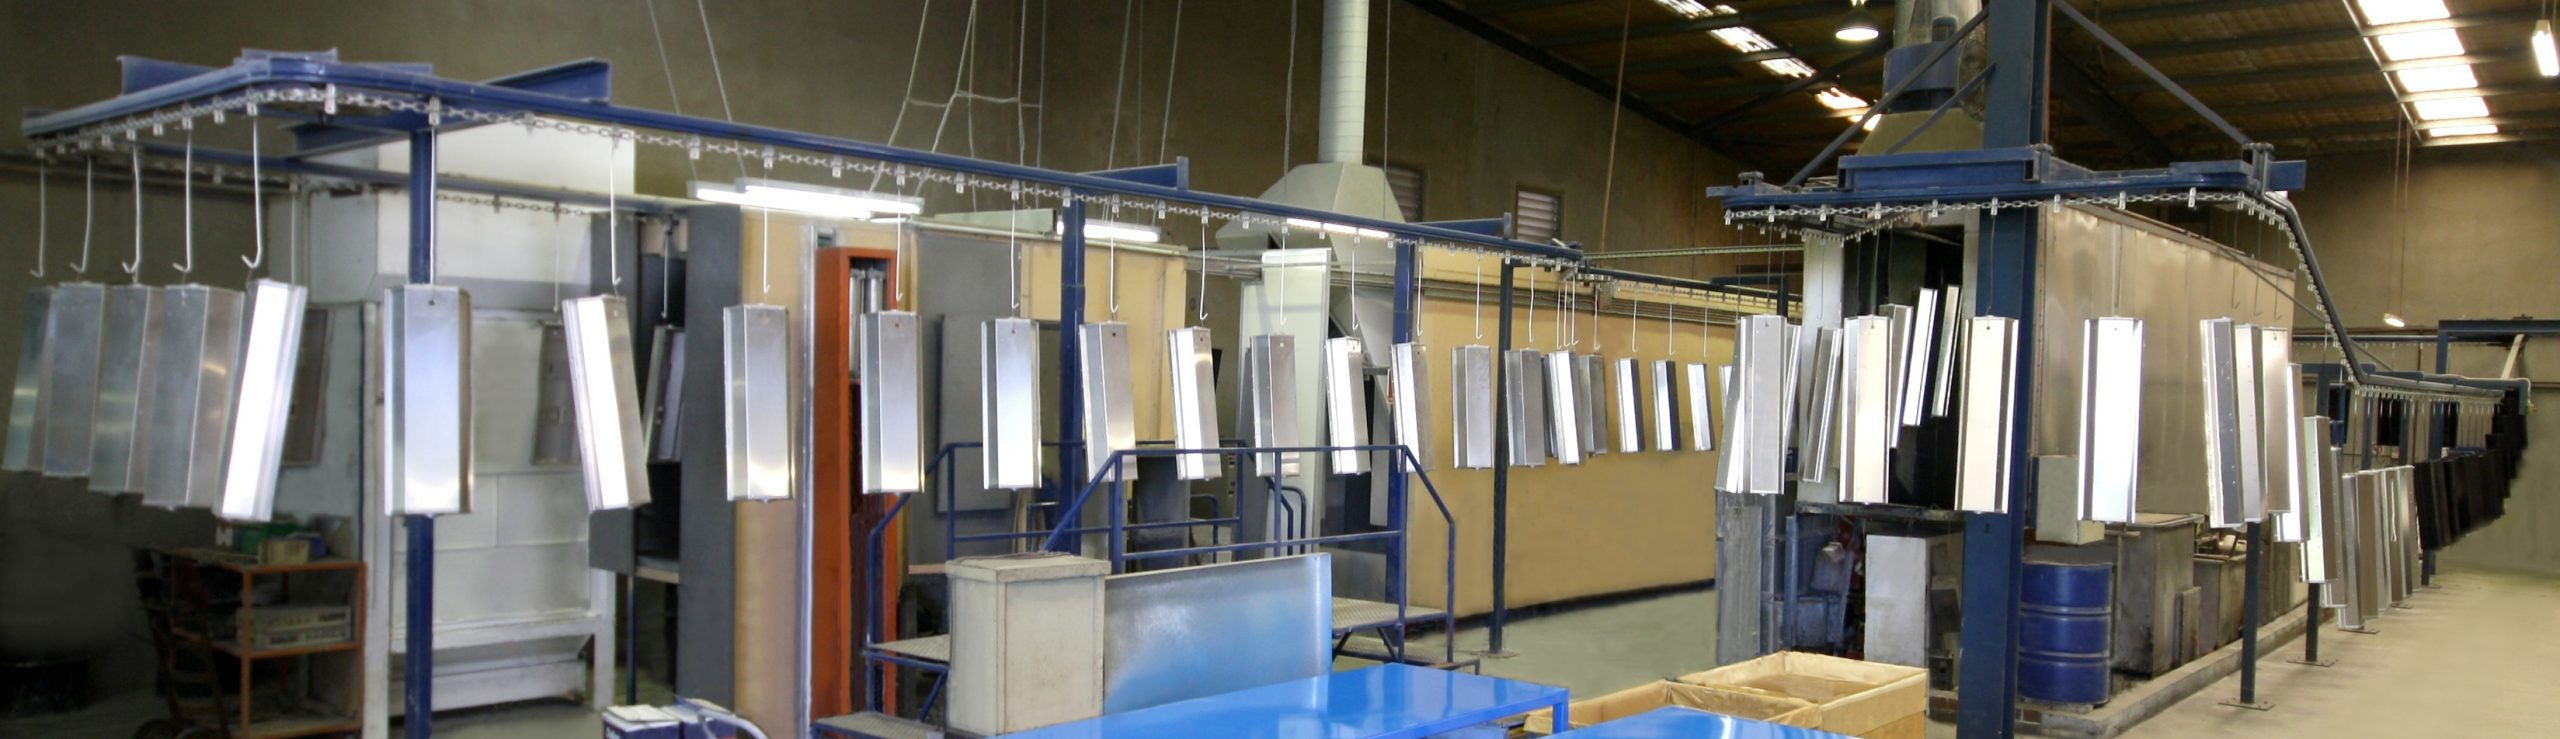 AMPC Powder Coating | Sheetmetal Sydney, Penrith